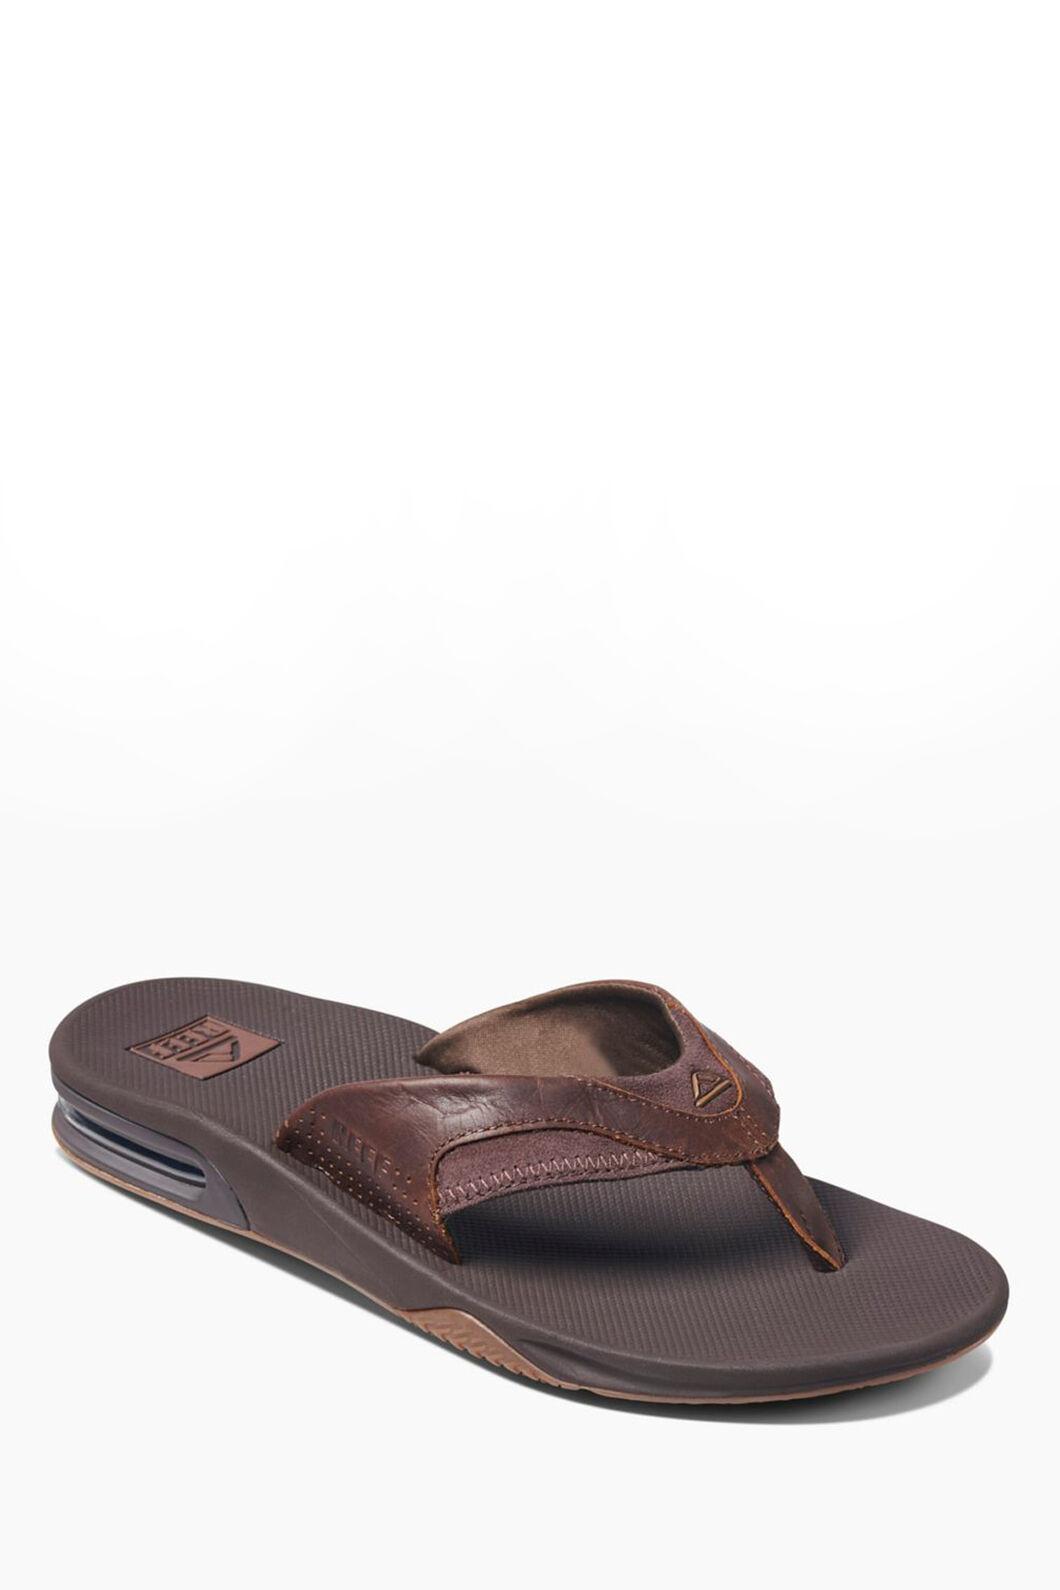 Reef Fanning Leather Sandals — Men's, Dark Brown, hi-res